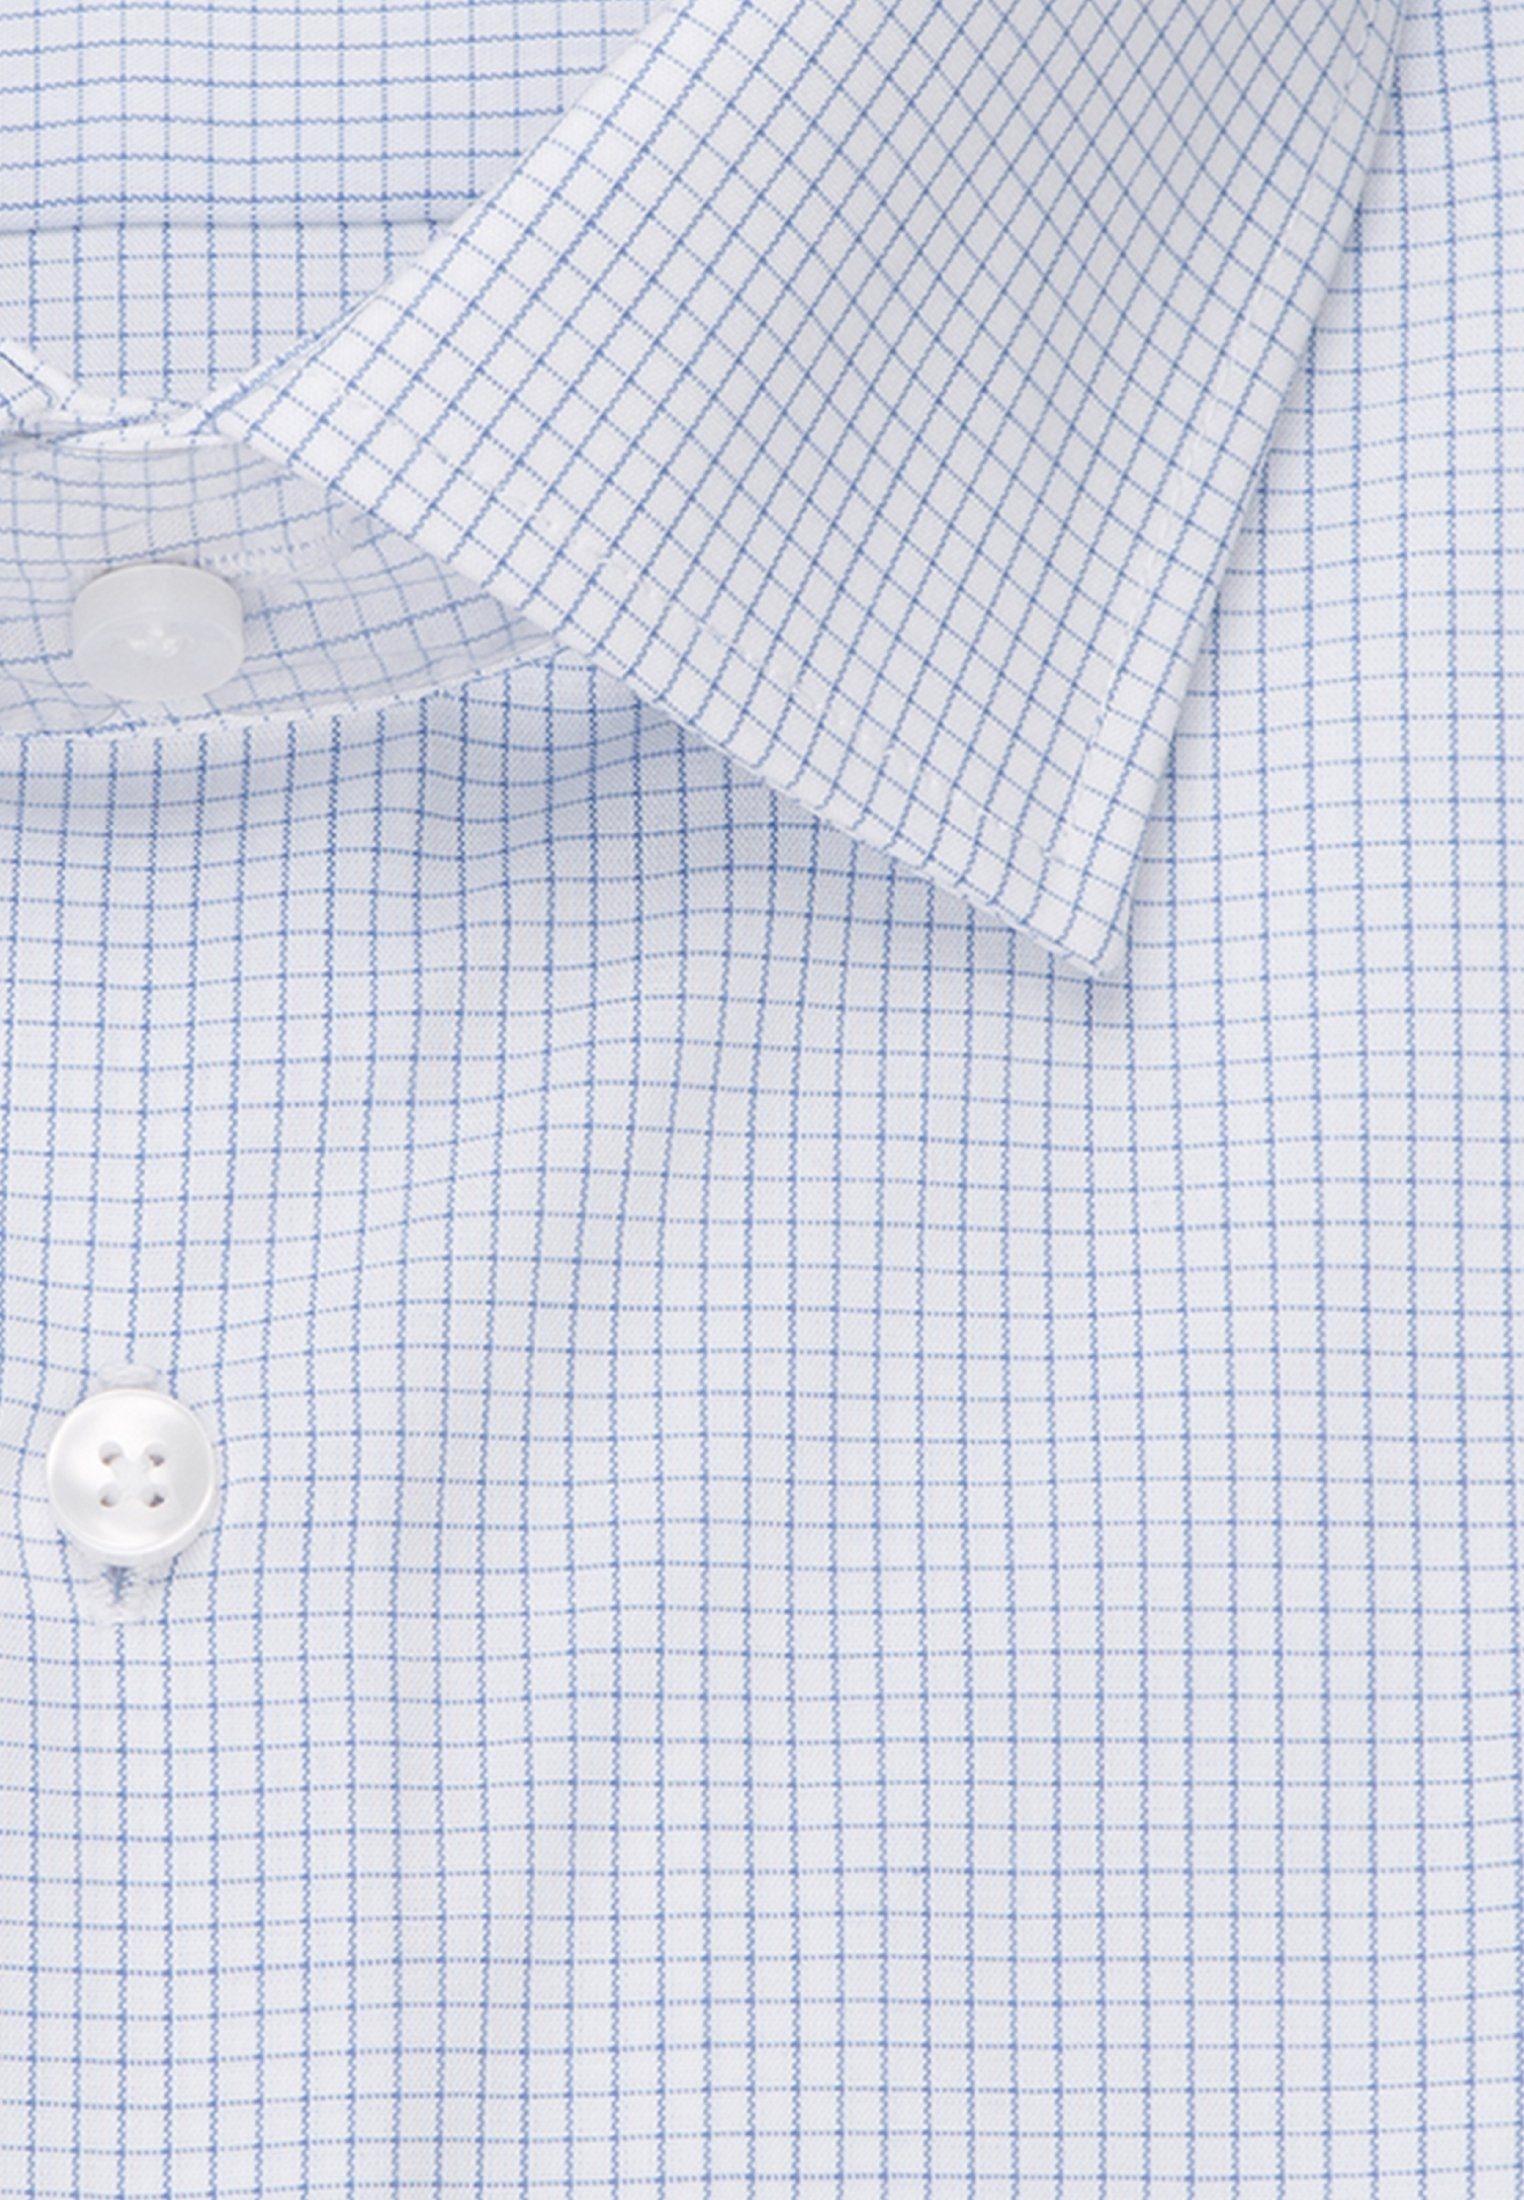 kragen Kurzarm Tailored »tailored« Businesshemd Seidensticker Kent Karo qOH16nx